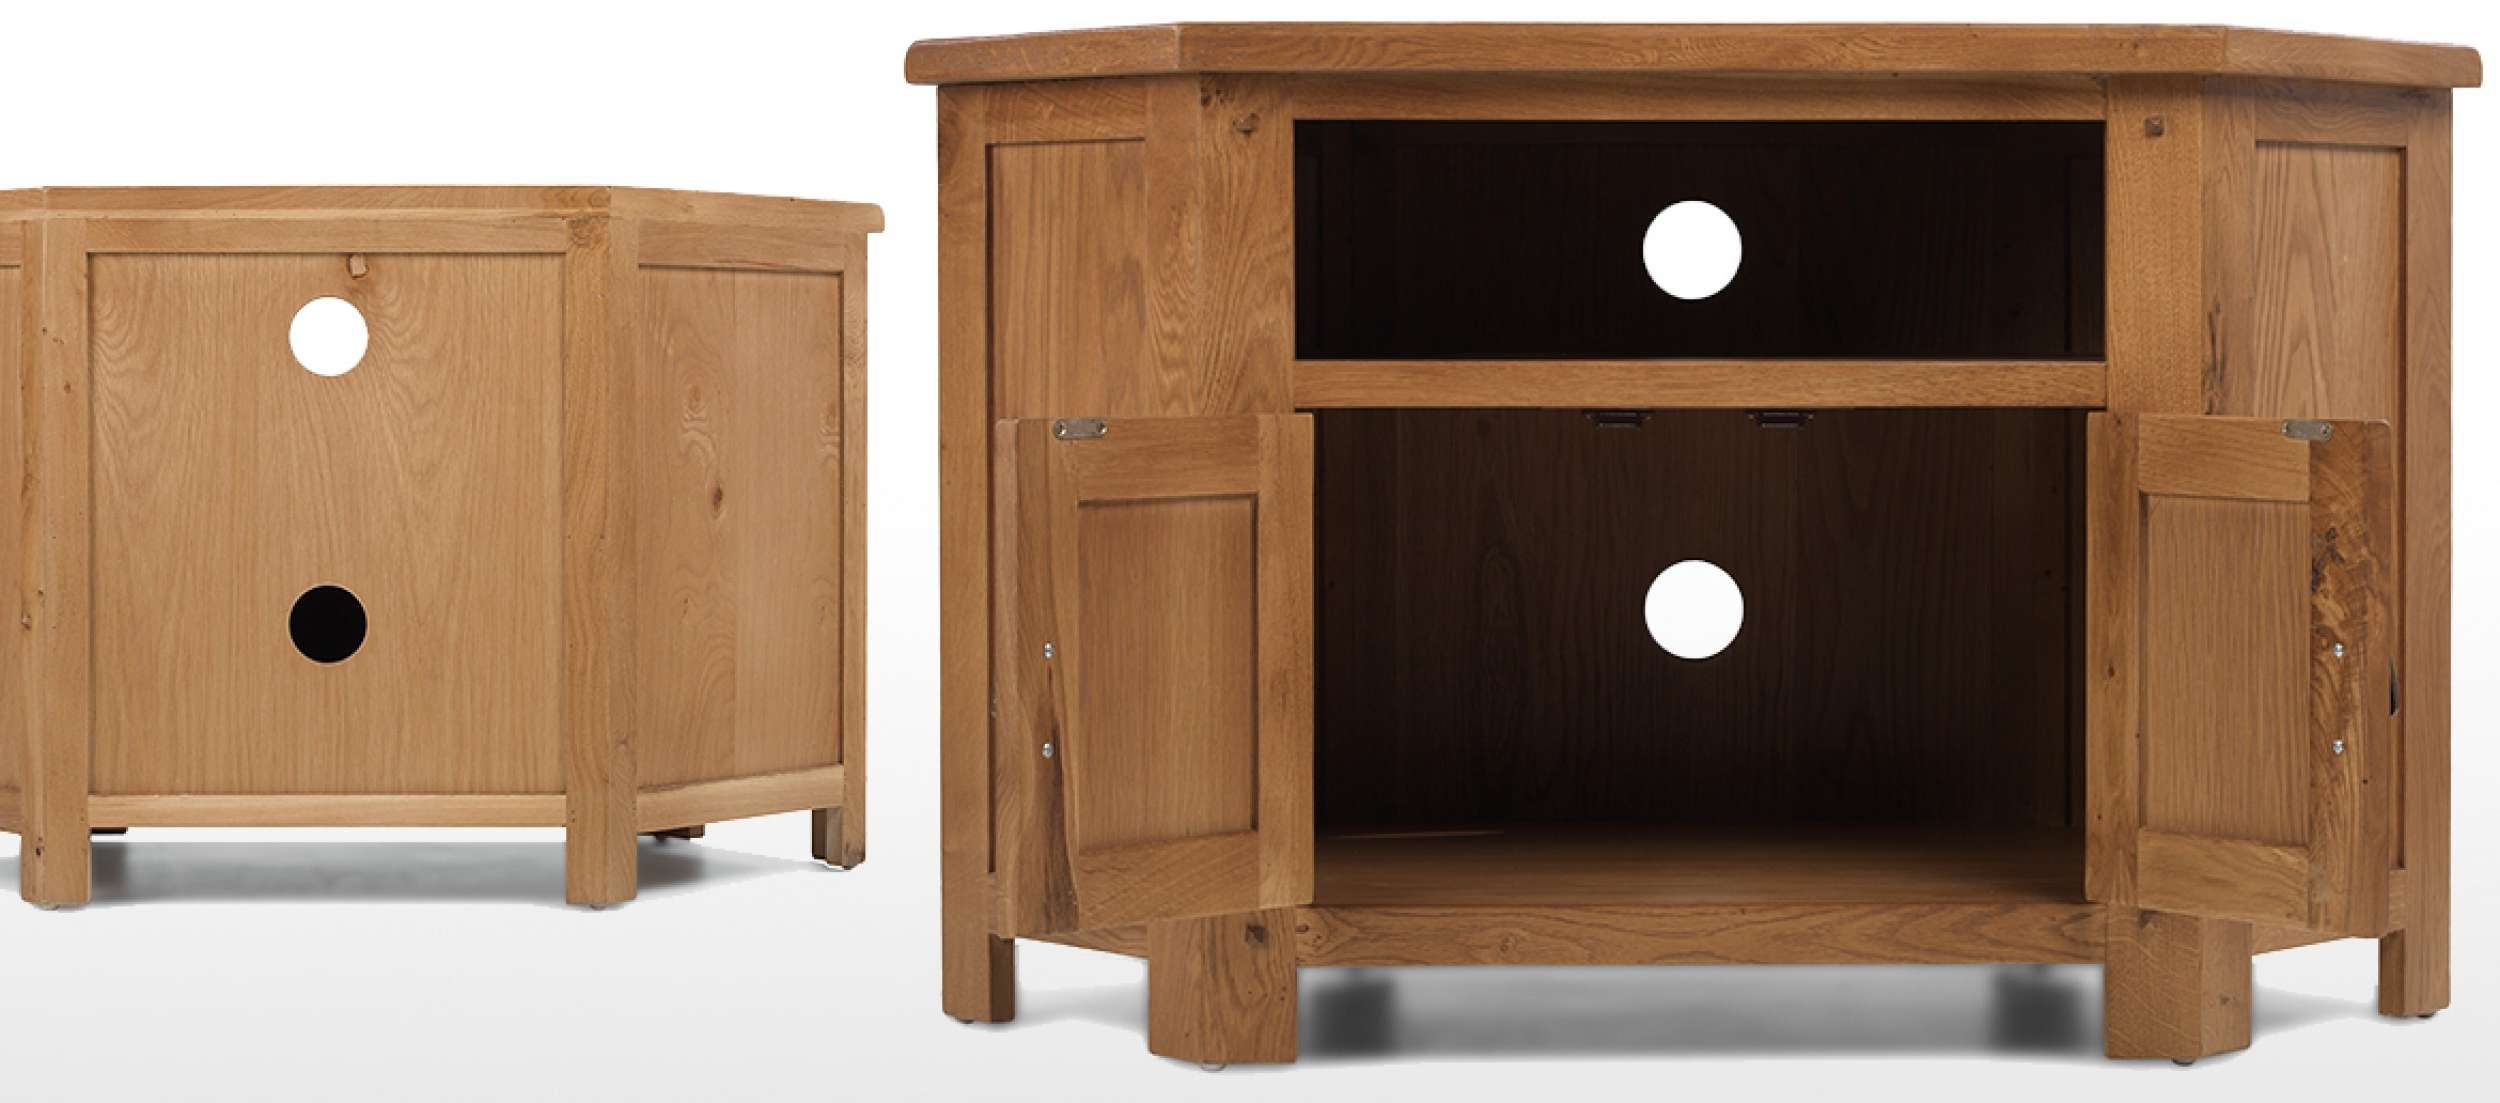 Rustic Oak Corner Tv Cabinet | Quercus Living In Rustic Corner Tv Stands (View 6 of 15)